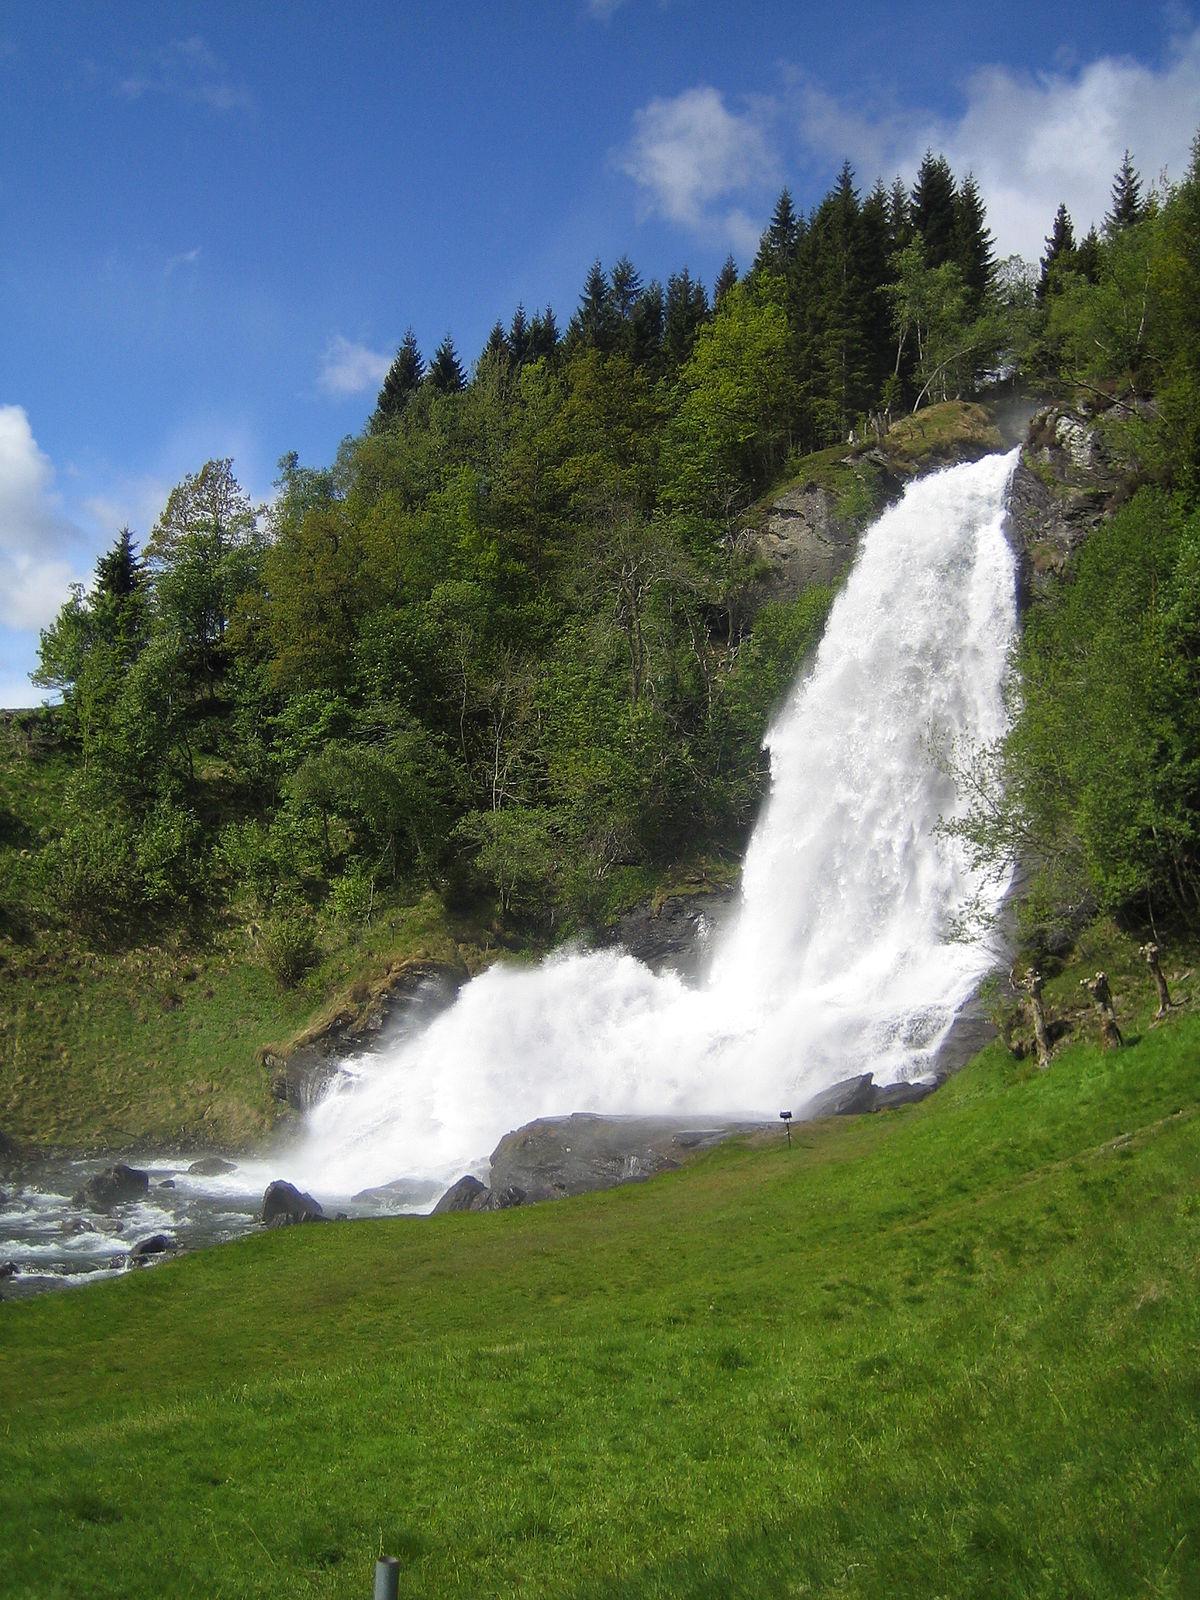 Fall Waterfall Wallpaper Hd Steinsdalsfossen Wikipedia